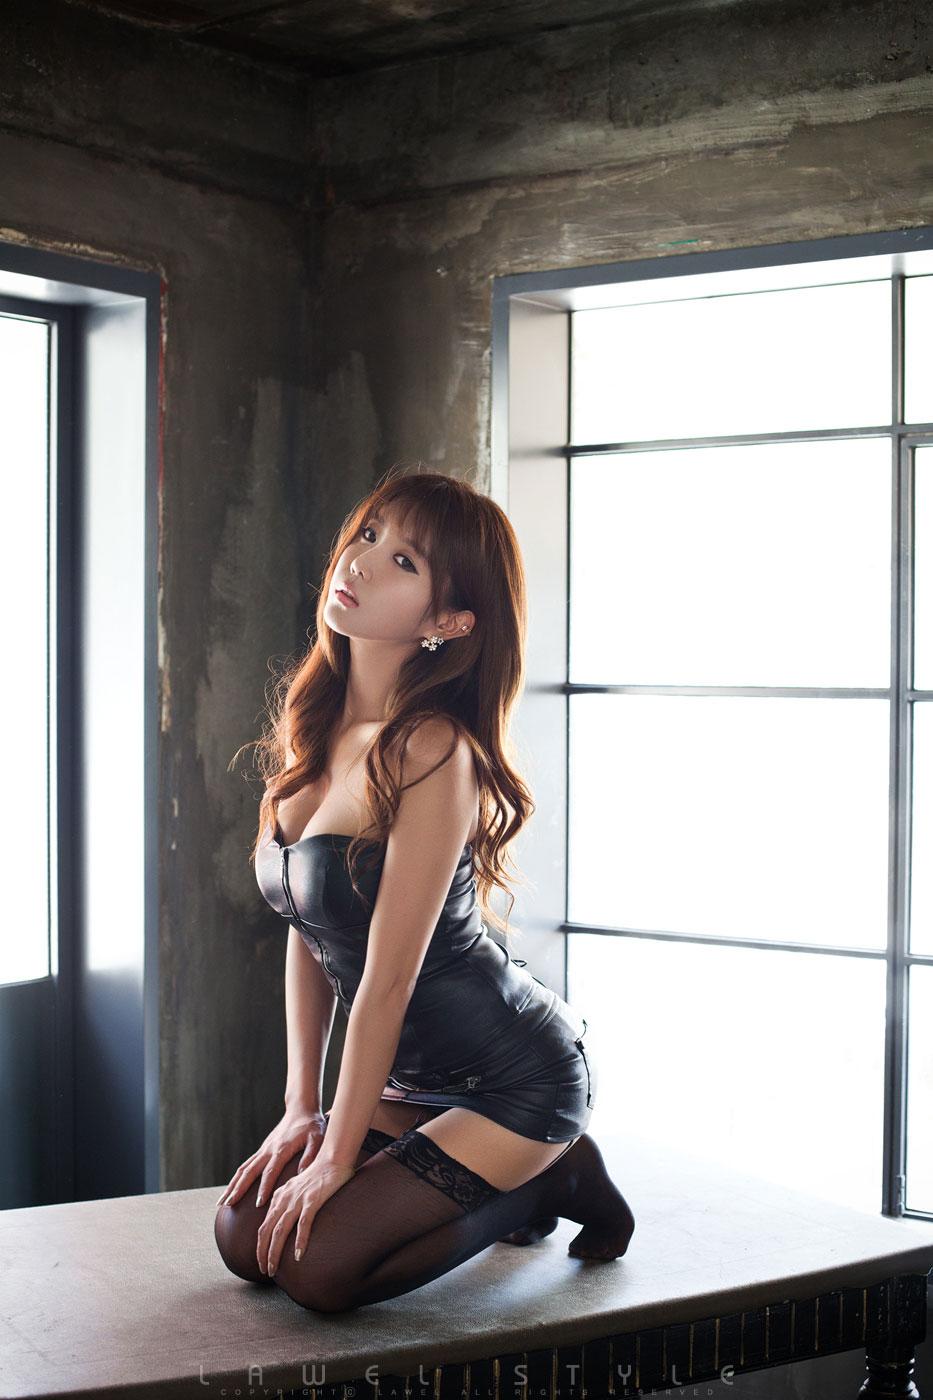 Girl Generation 2014 Wallpaper Korean Girls Hd Special 500 Recap